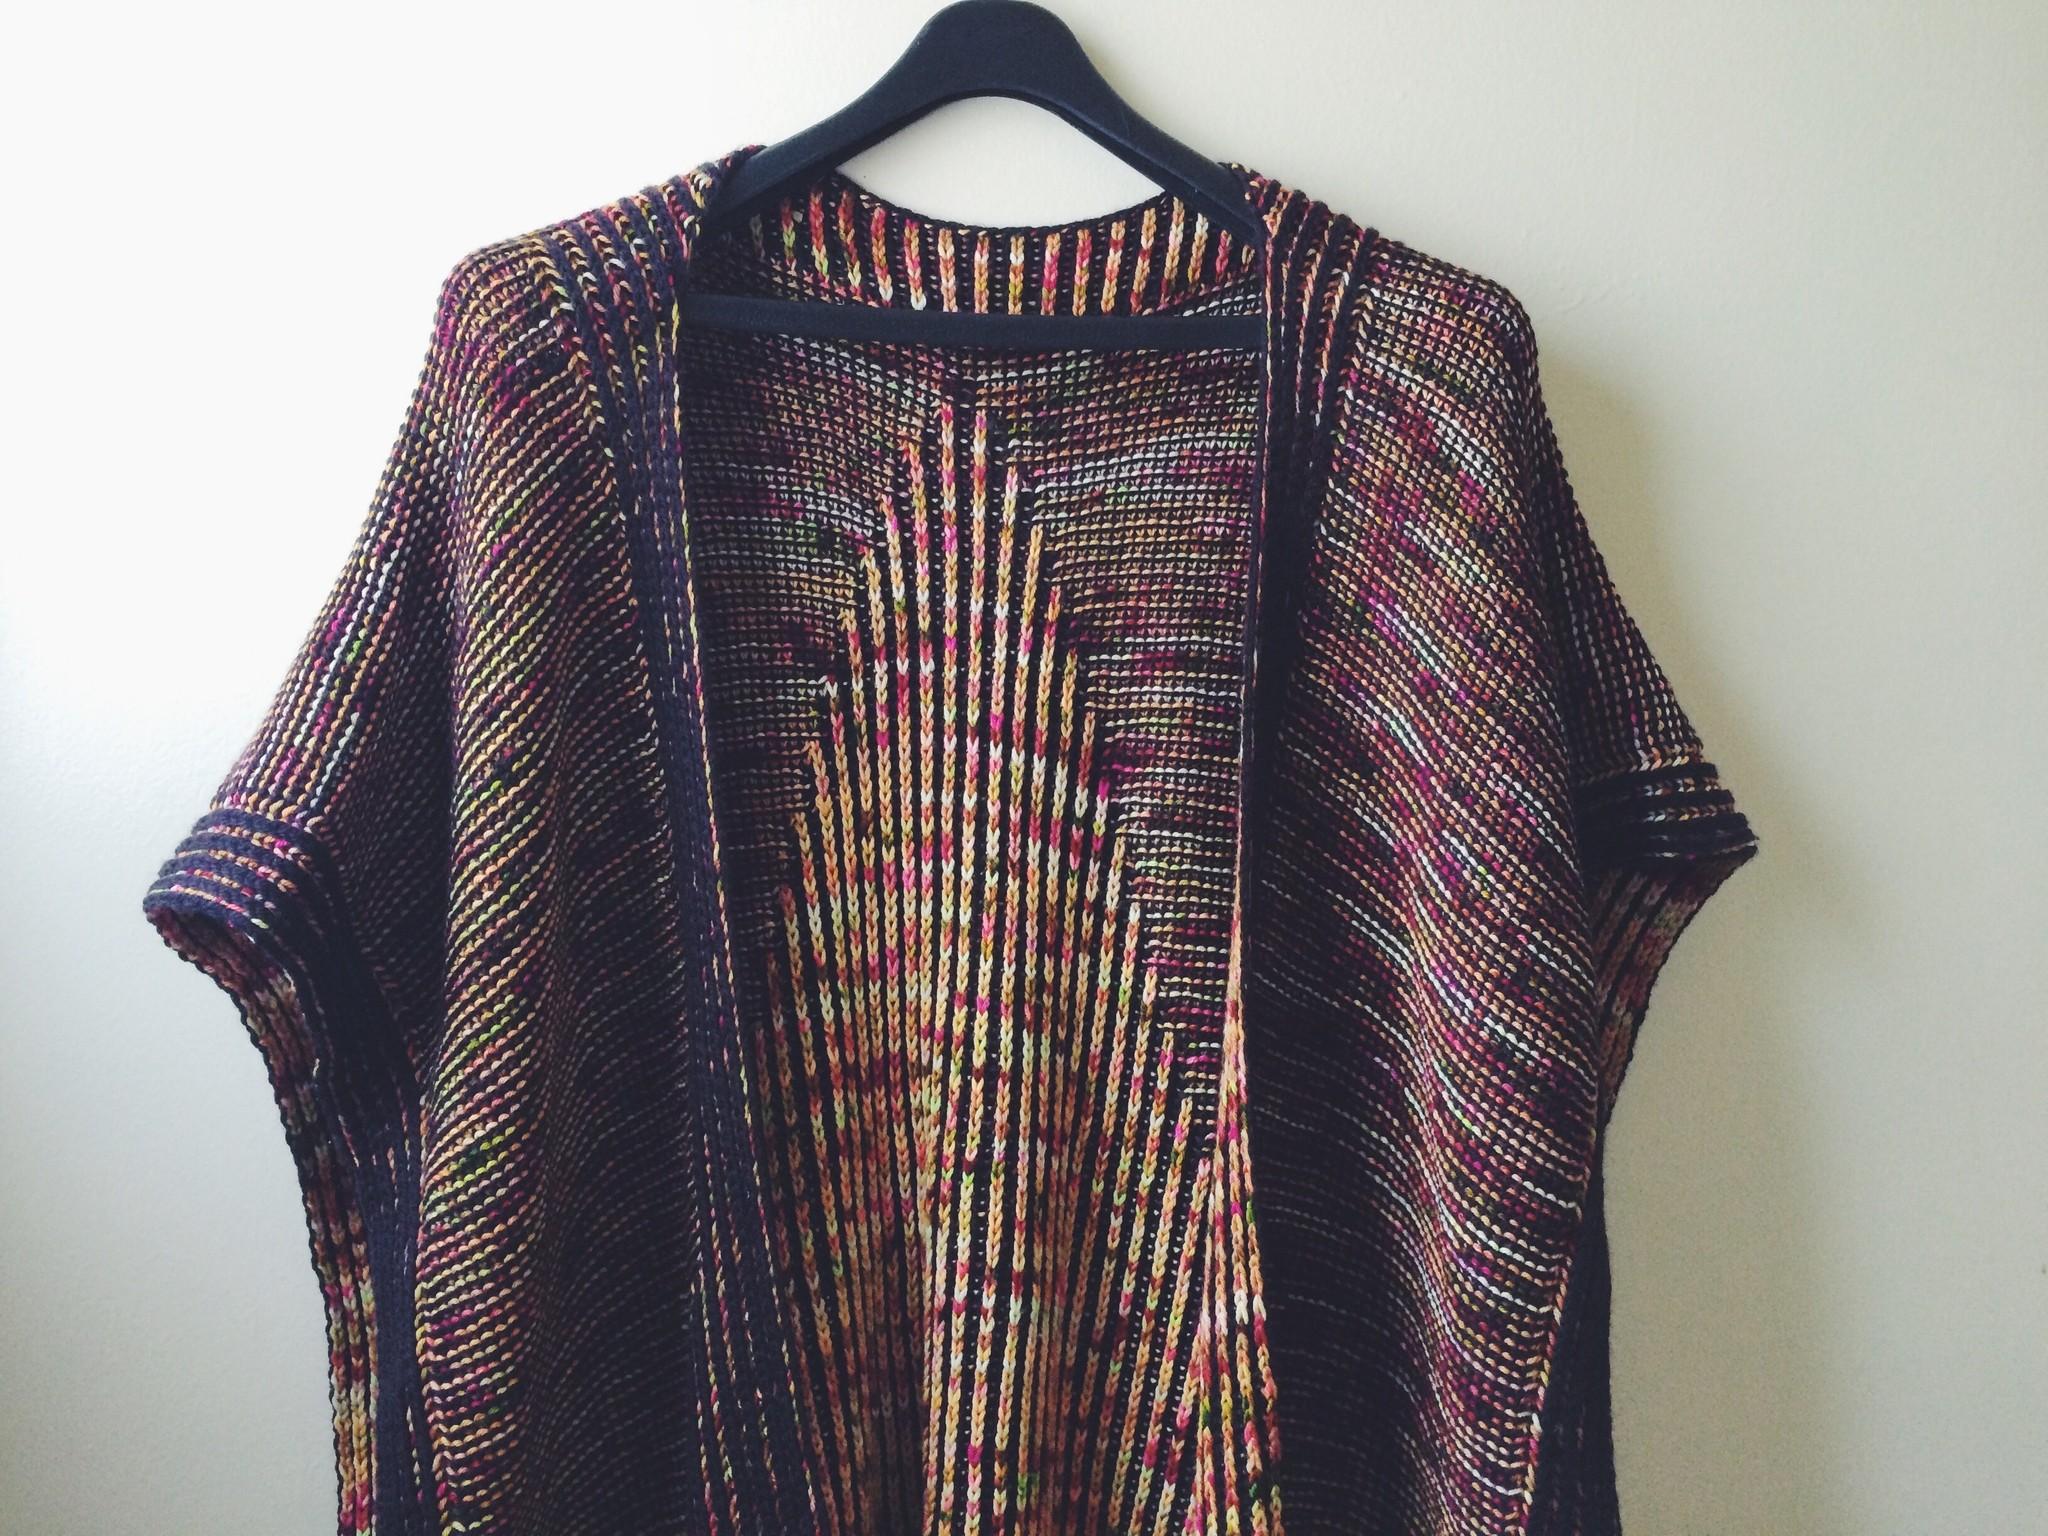 midnight madness brioche knitting pattern